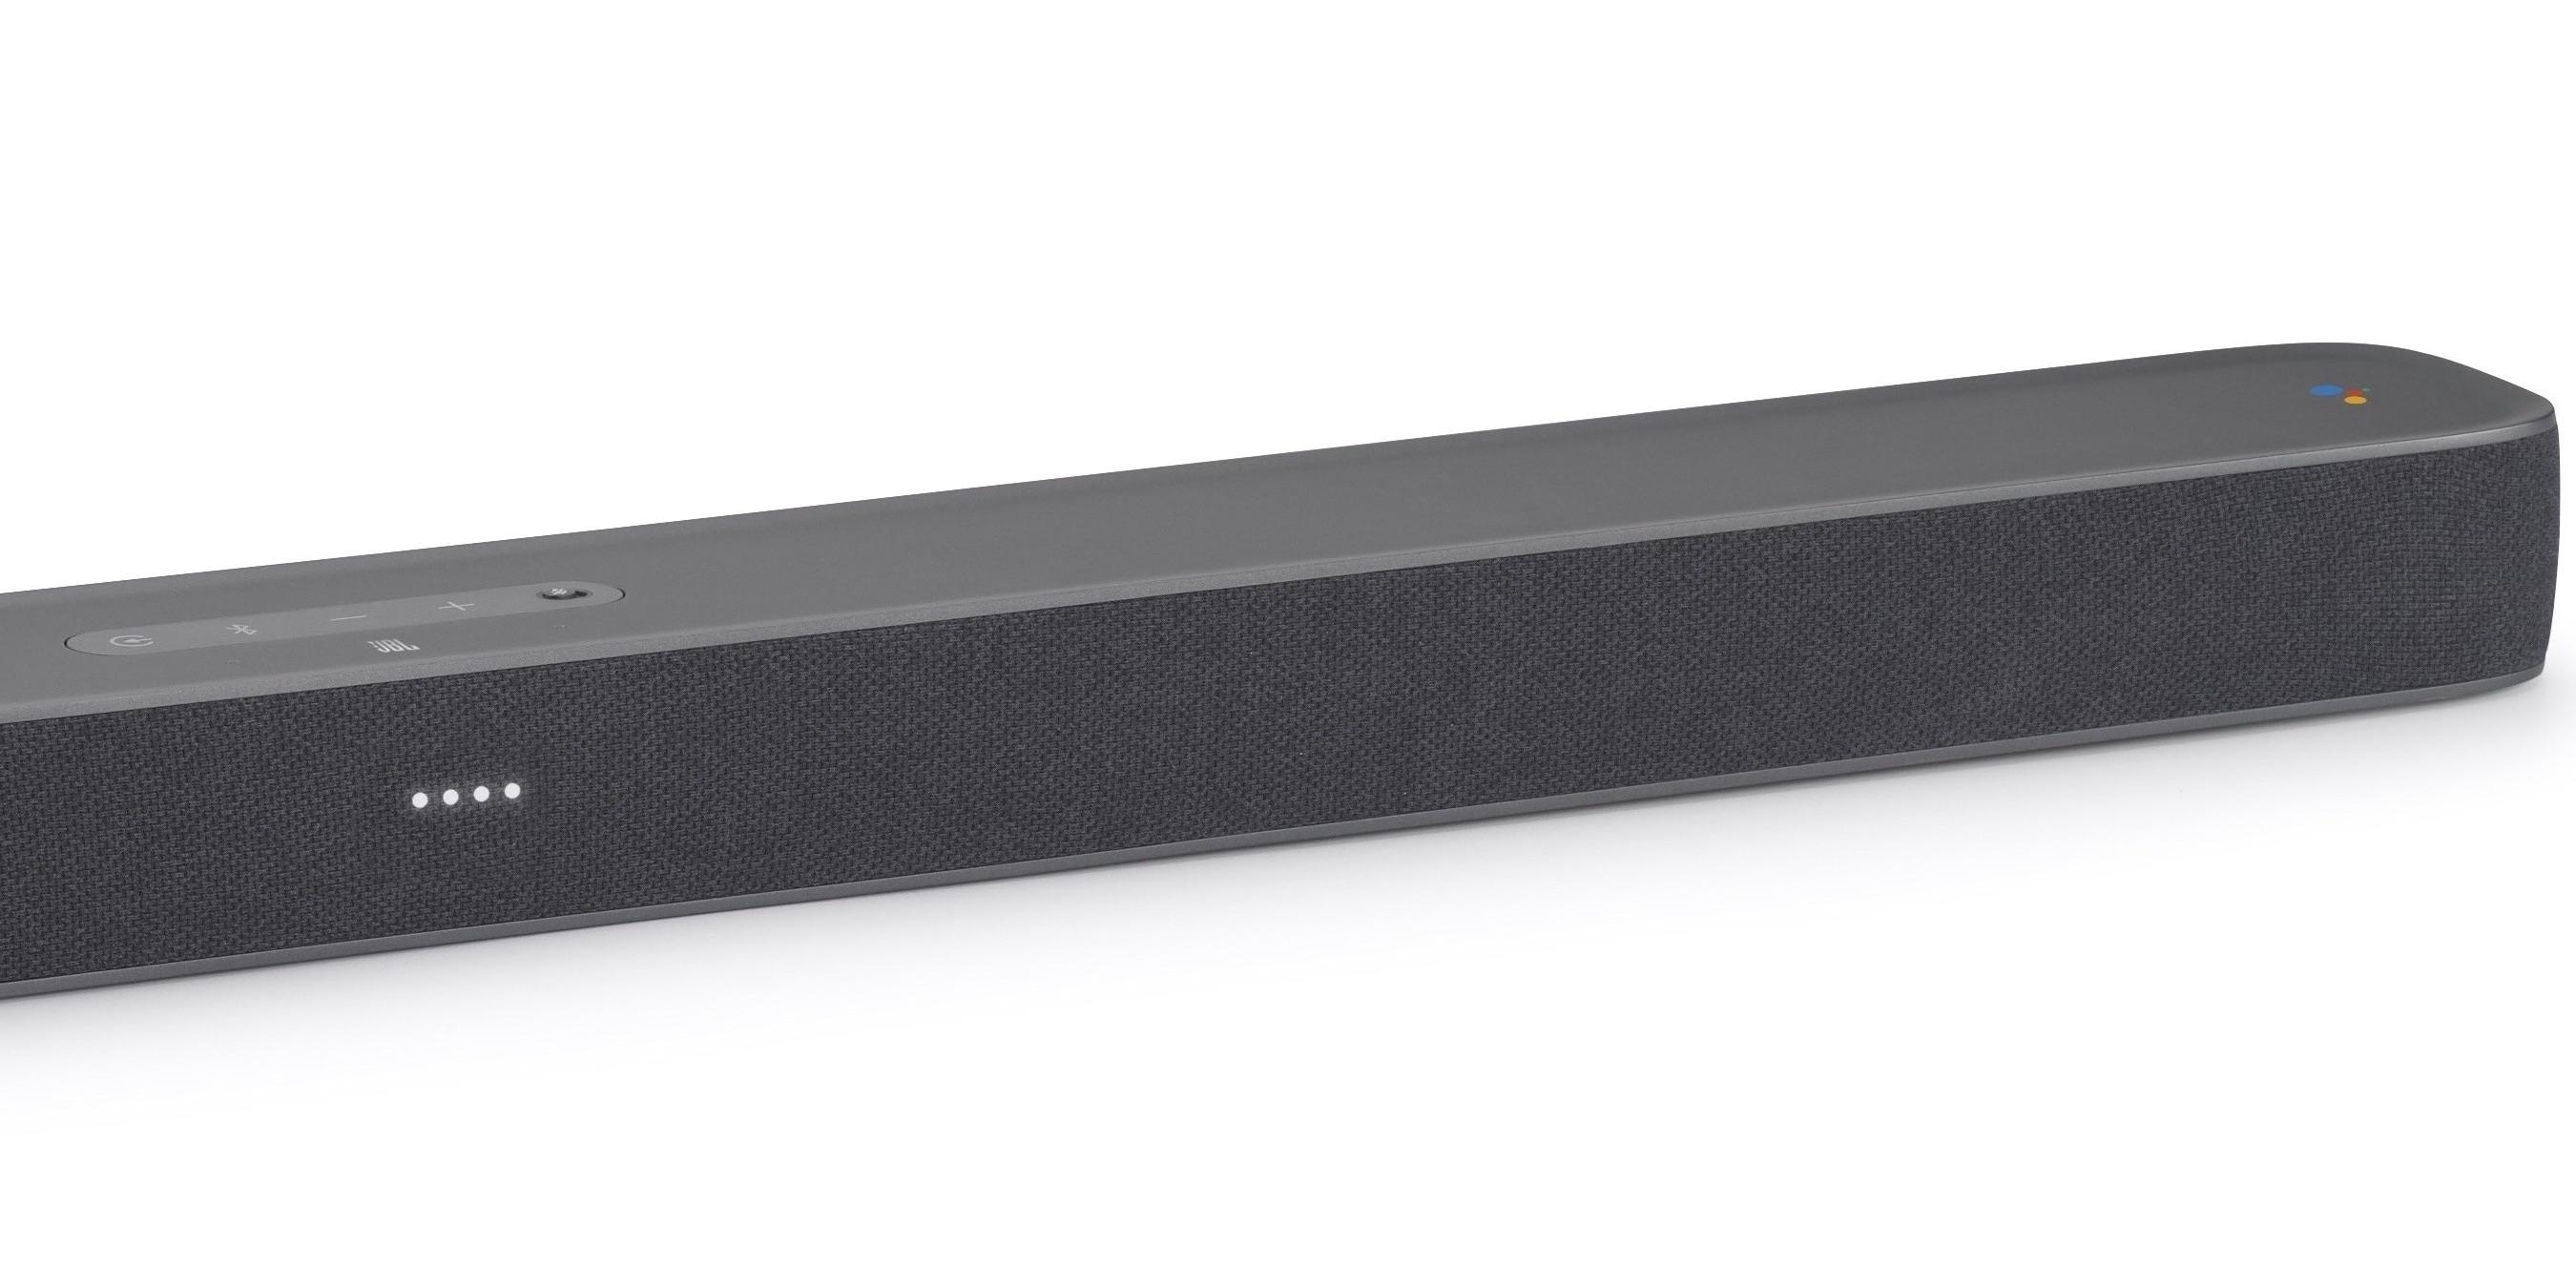 google announces jbl link bar first hybrid android tv soundbar w